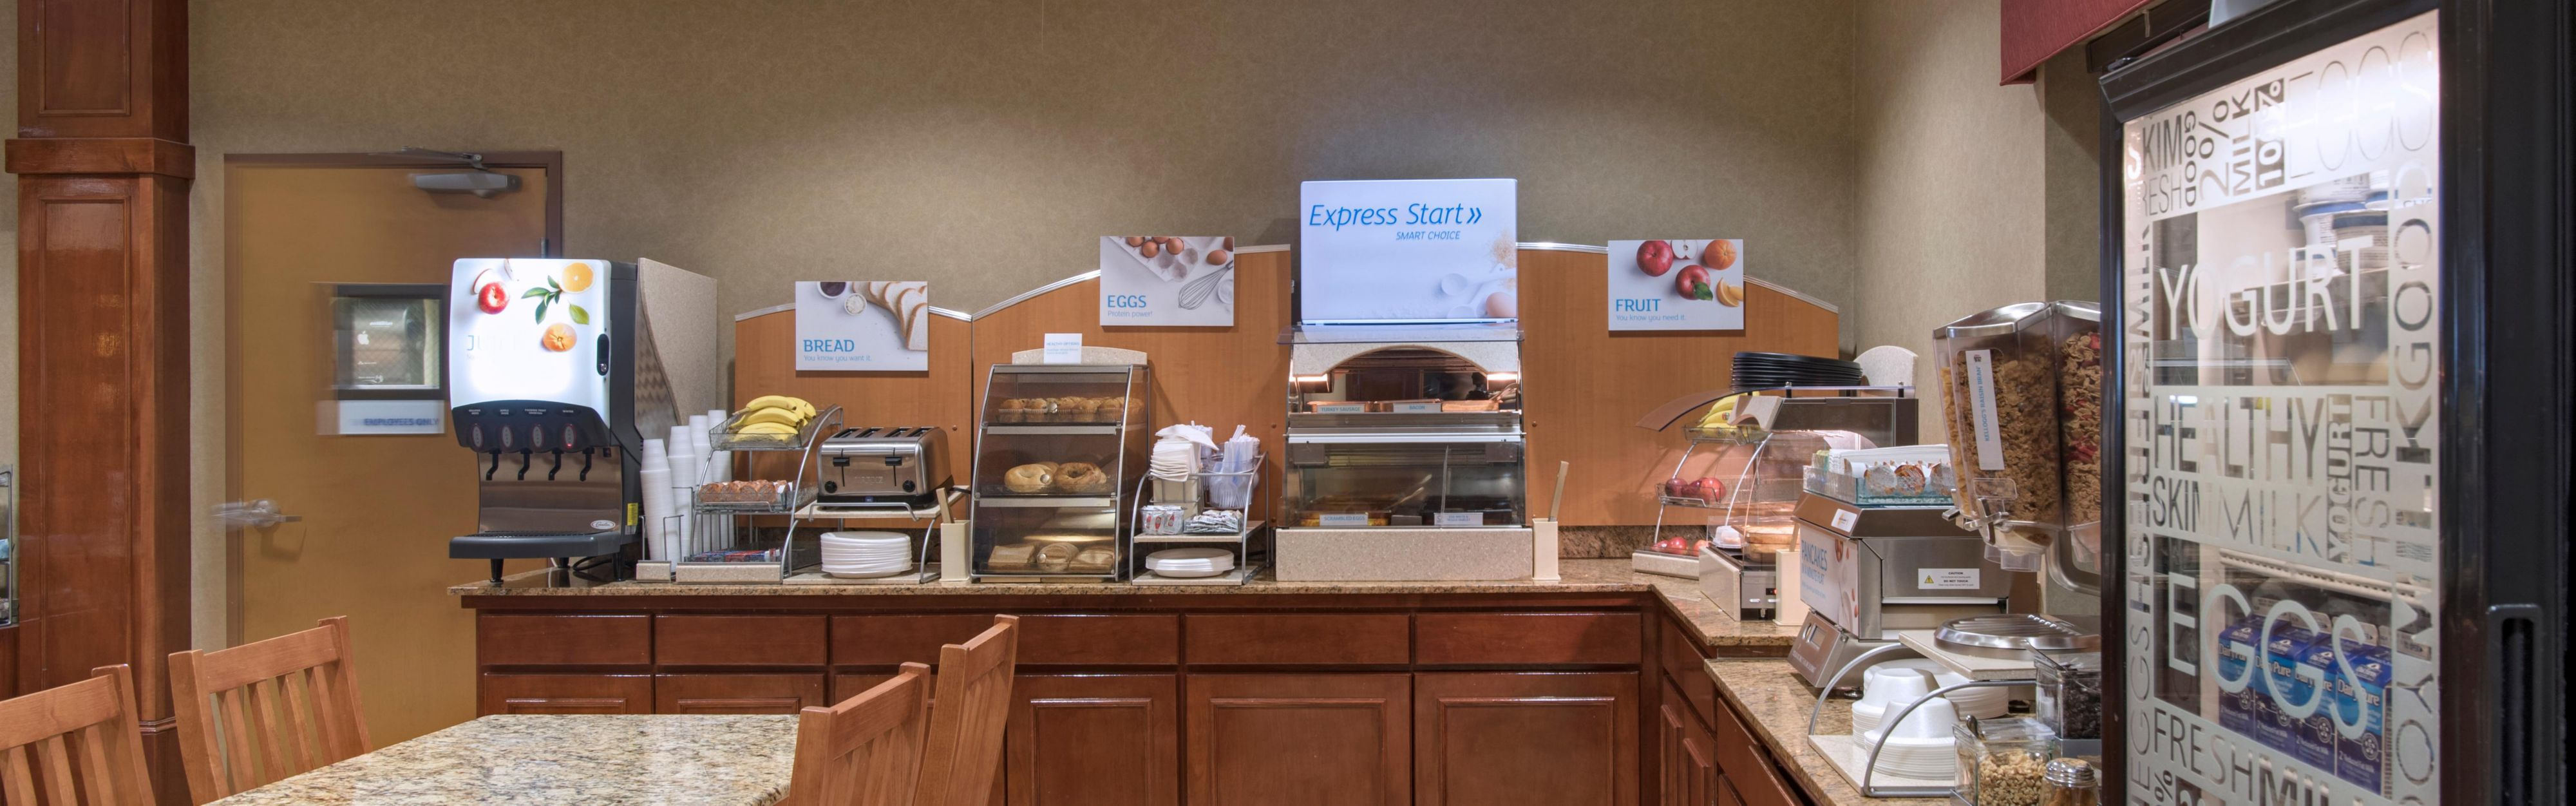 Holiday Inn Express & Suites Cedar Park (Nw Austin) image 3